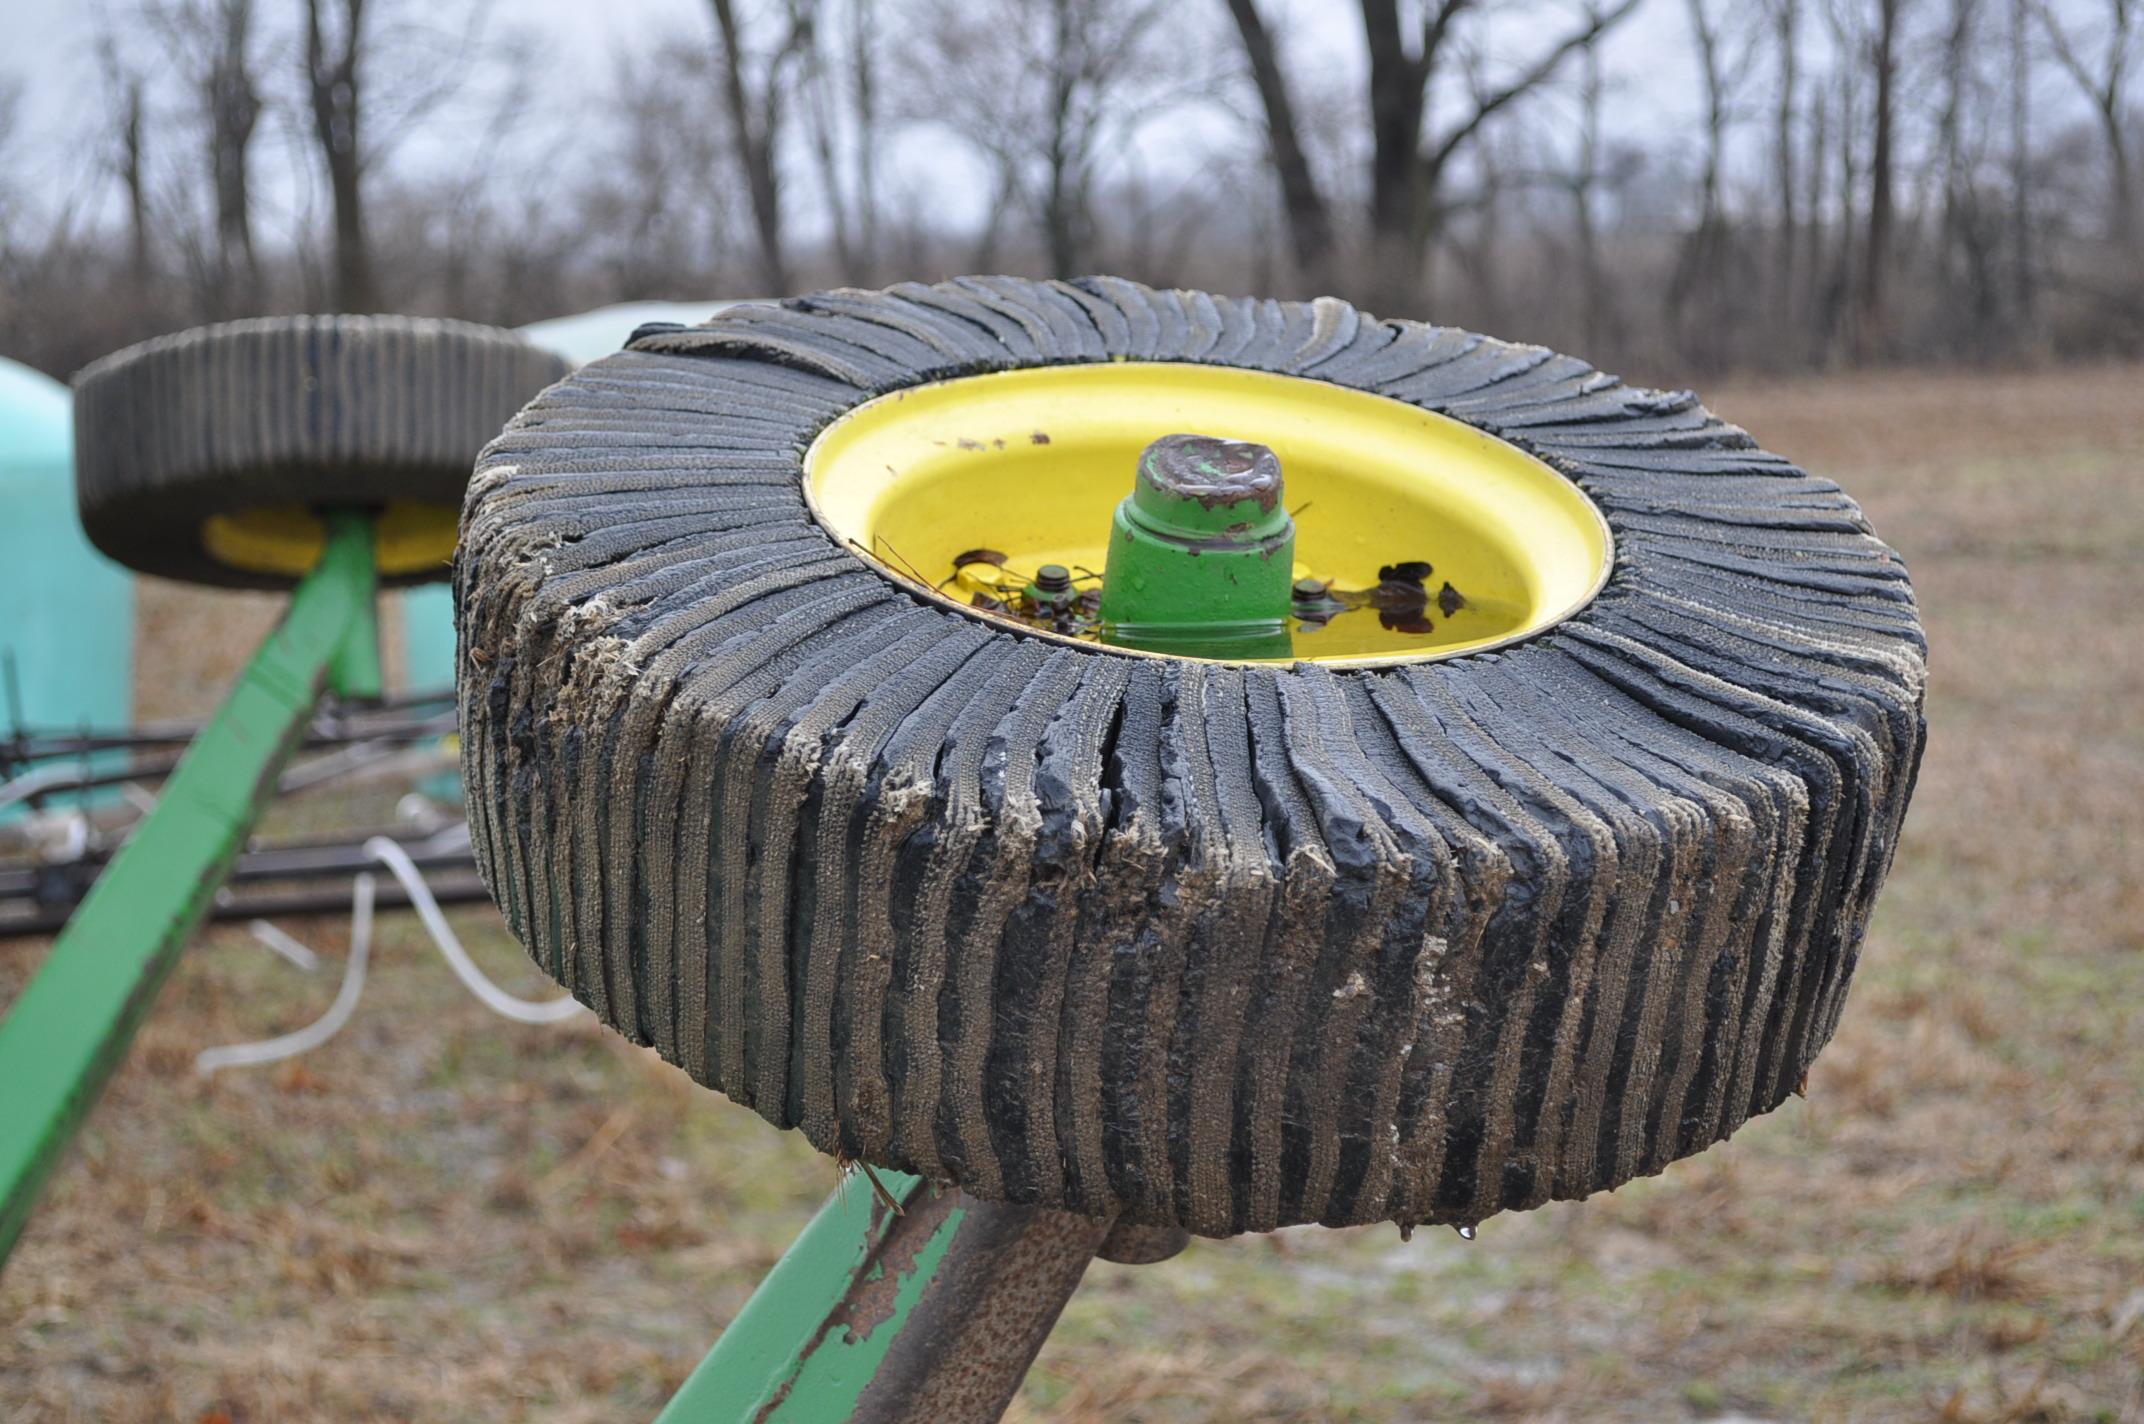 15' John Deere 1508 rotary mower, hyd fold, 1000 pto - Image 12 of 13